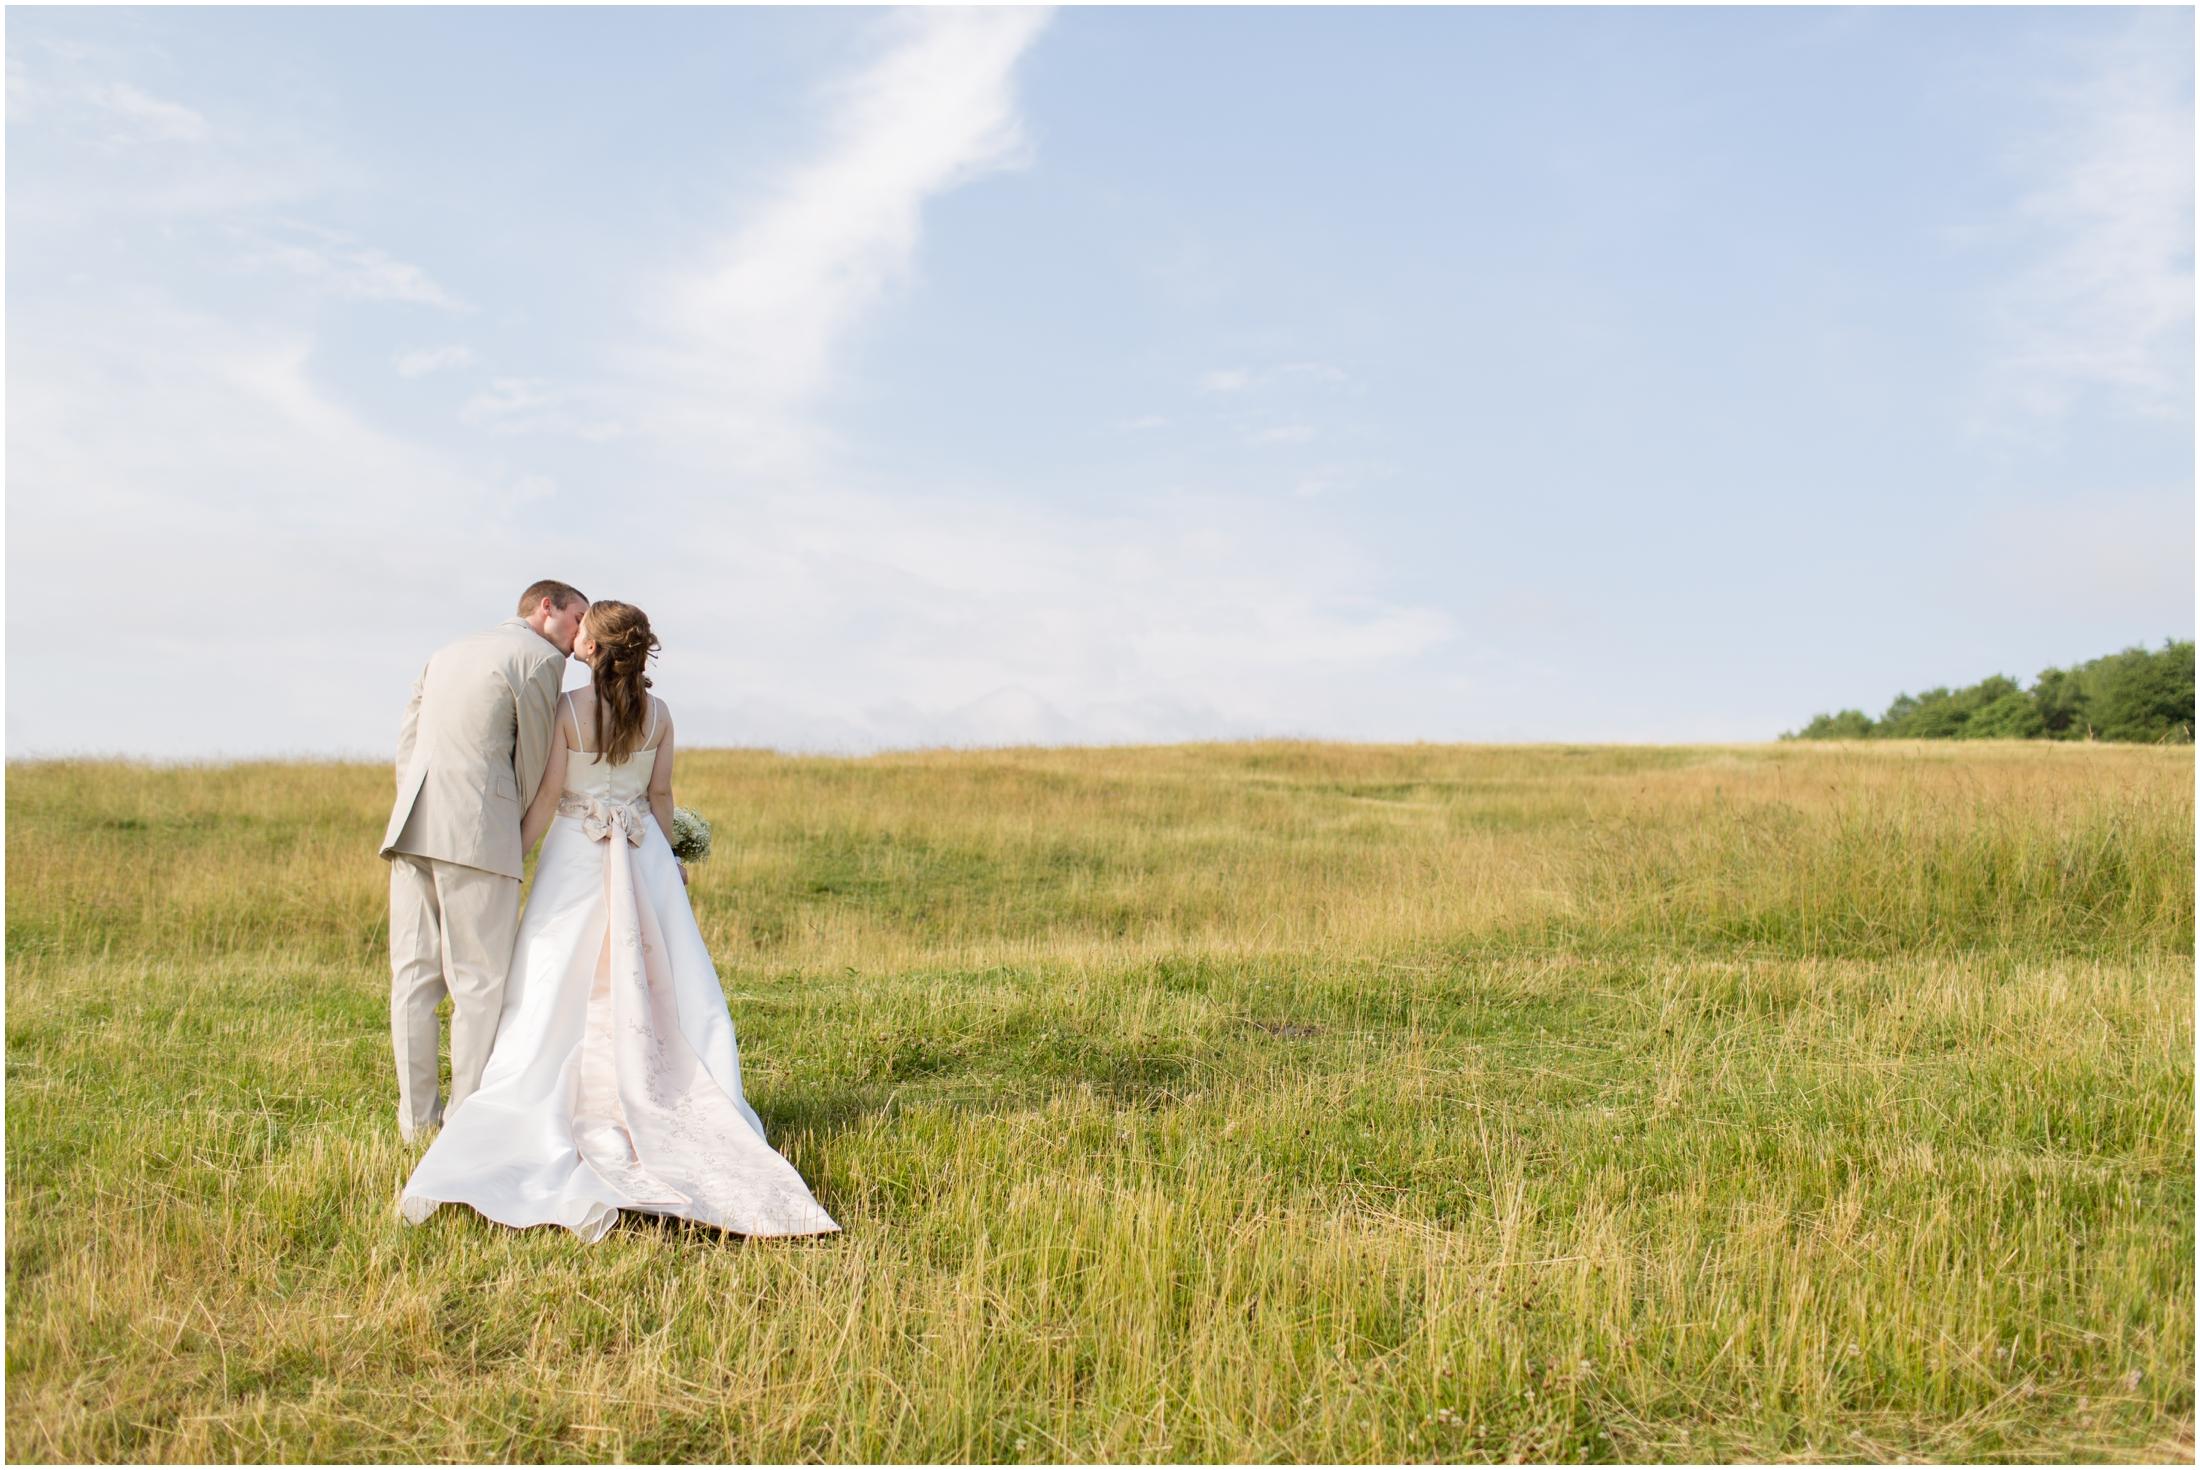 Nash-Wedding-Bride-and-Groom-Portraits-1004.jpg